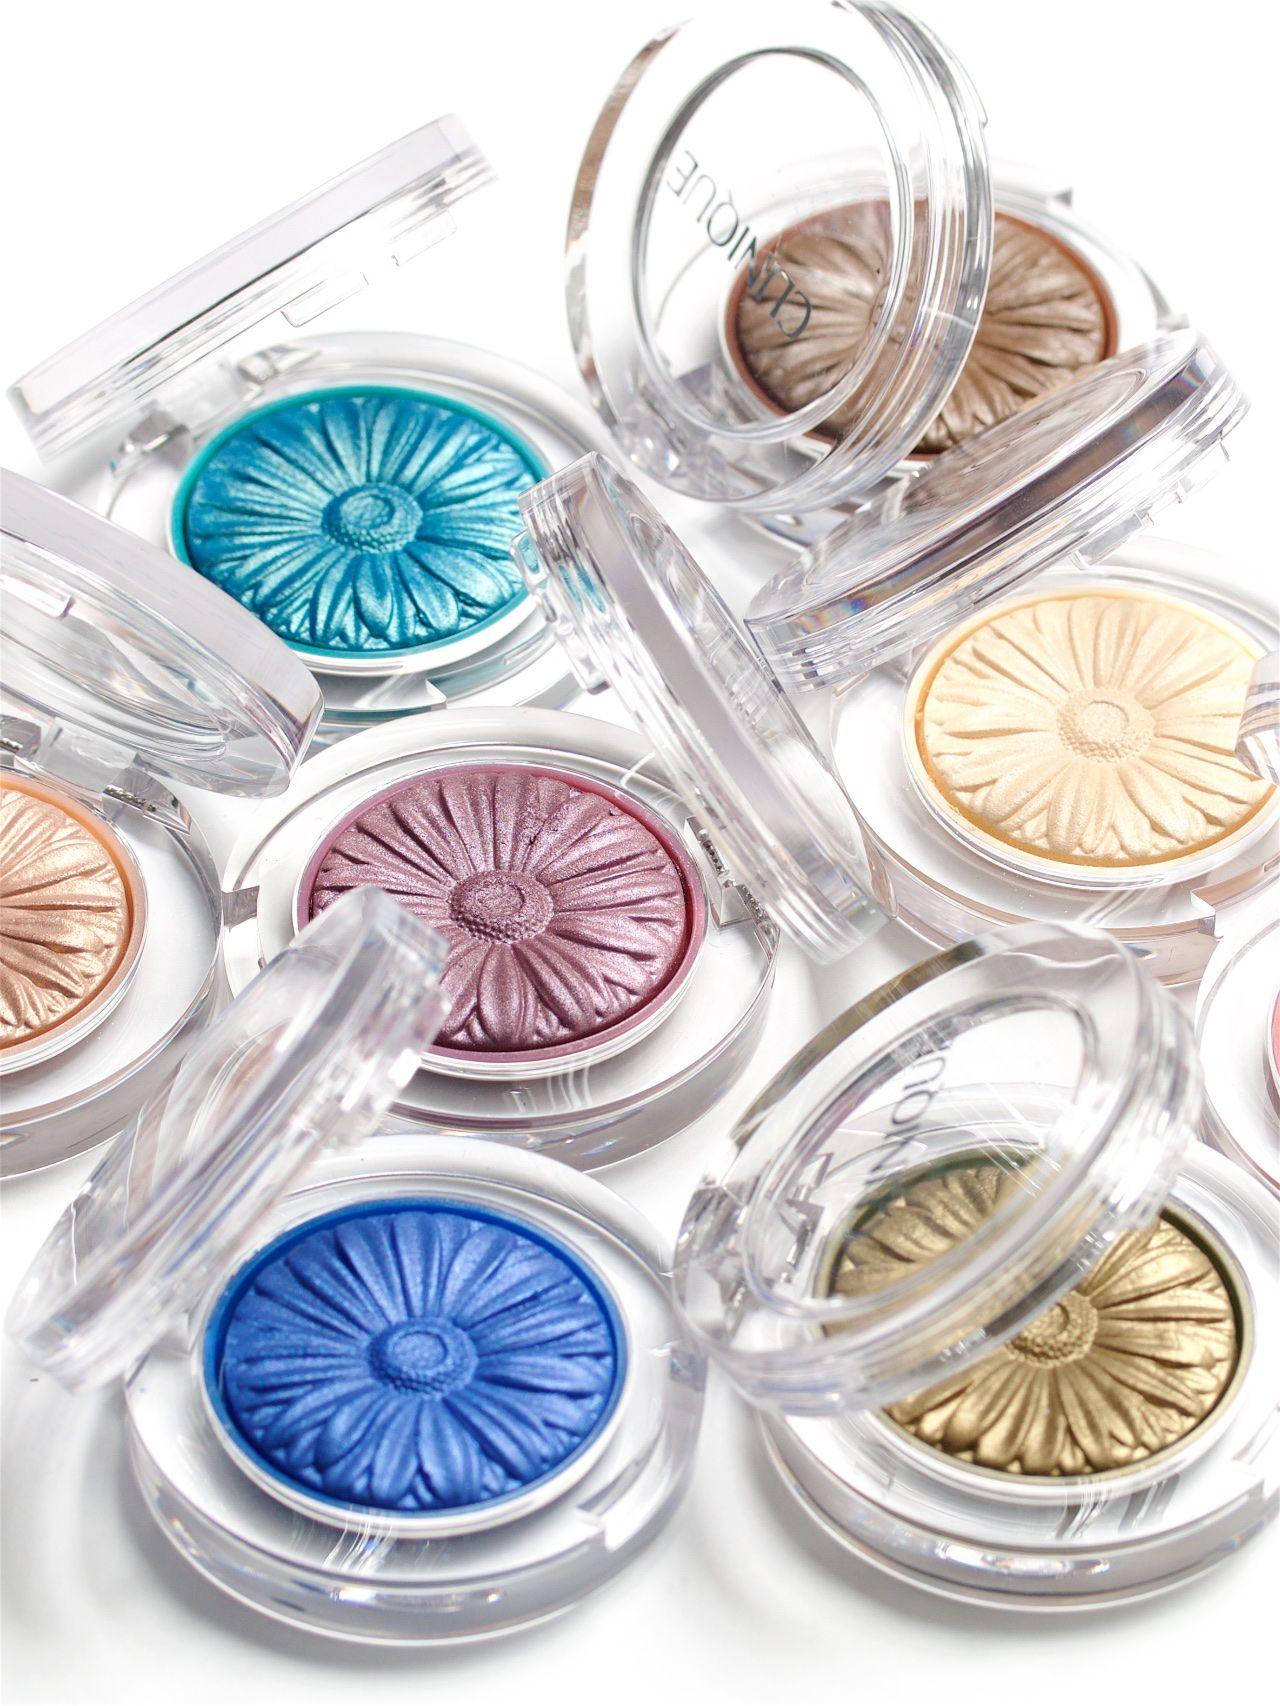 Clinique Lid Pops Review Clinique eyeshadow, Makeup